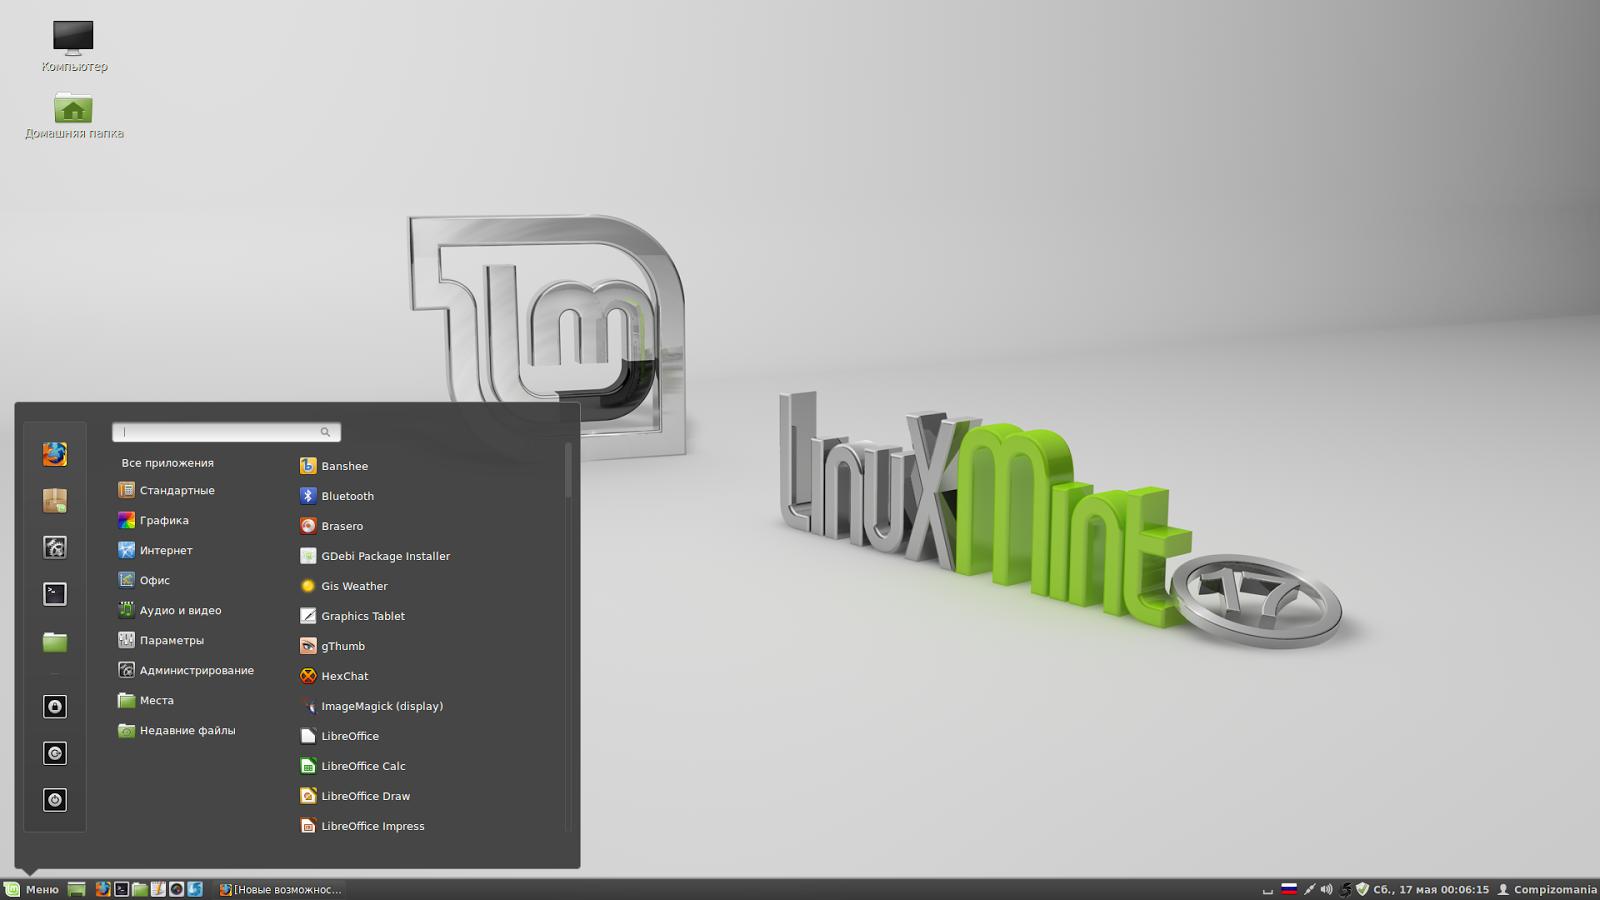 compizomania: Что нового в Linux Mint 17 Cinnamon